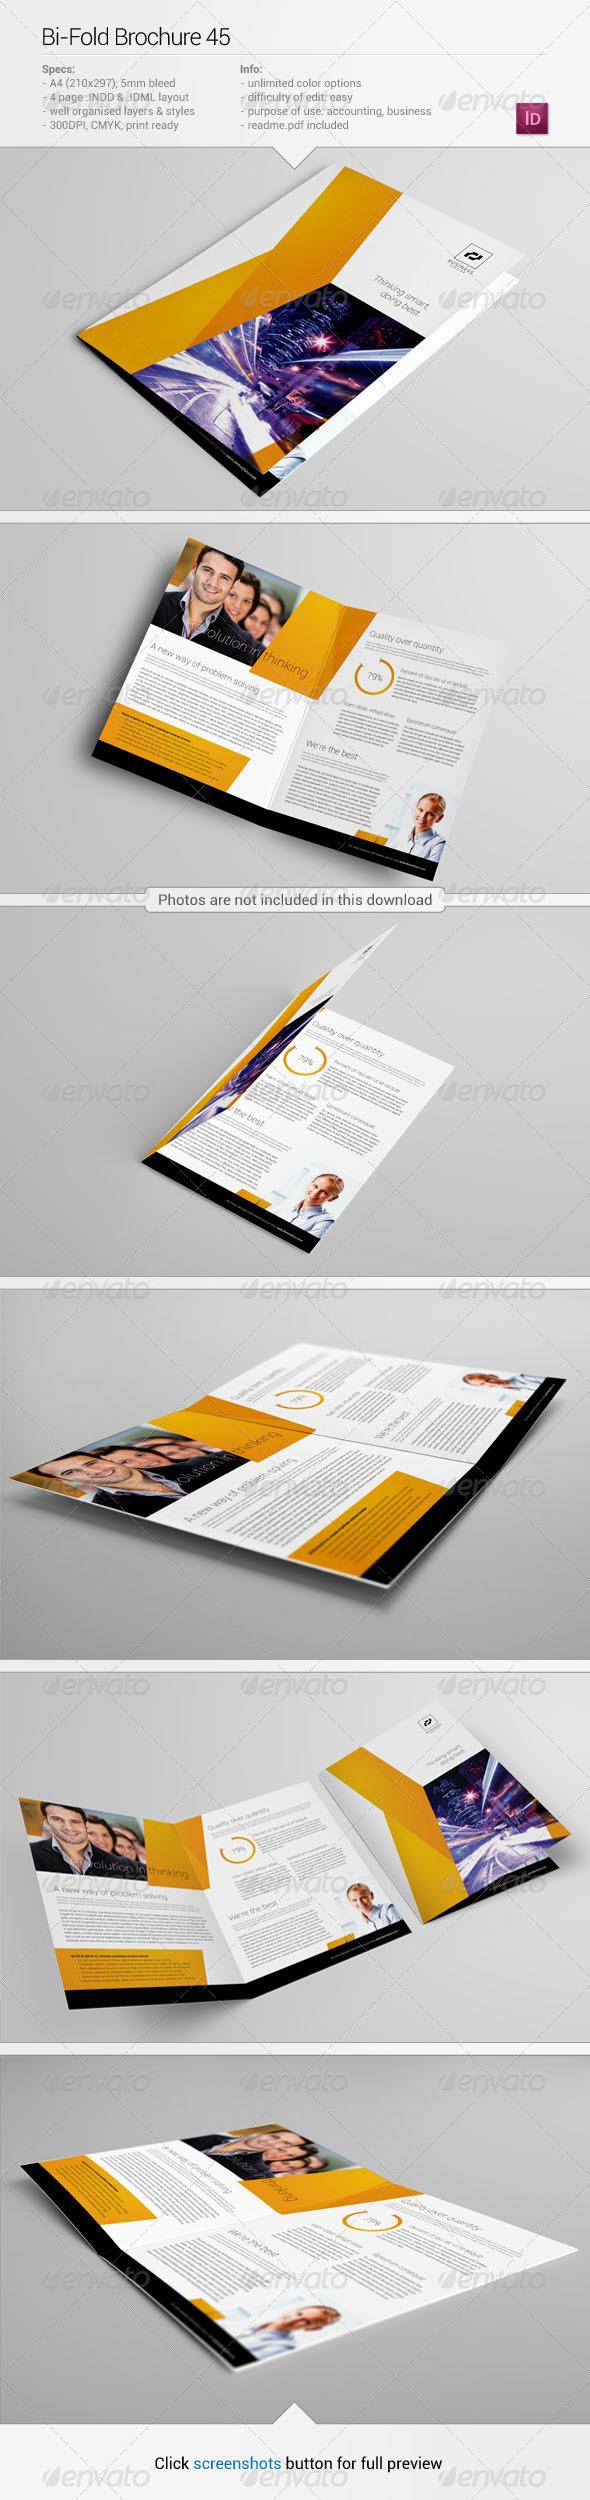 GraphicRiver Bi-Fold Brochure 45 6261790